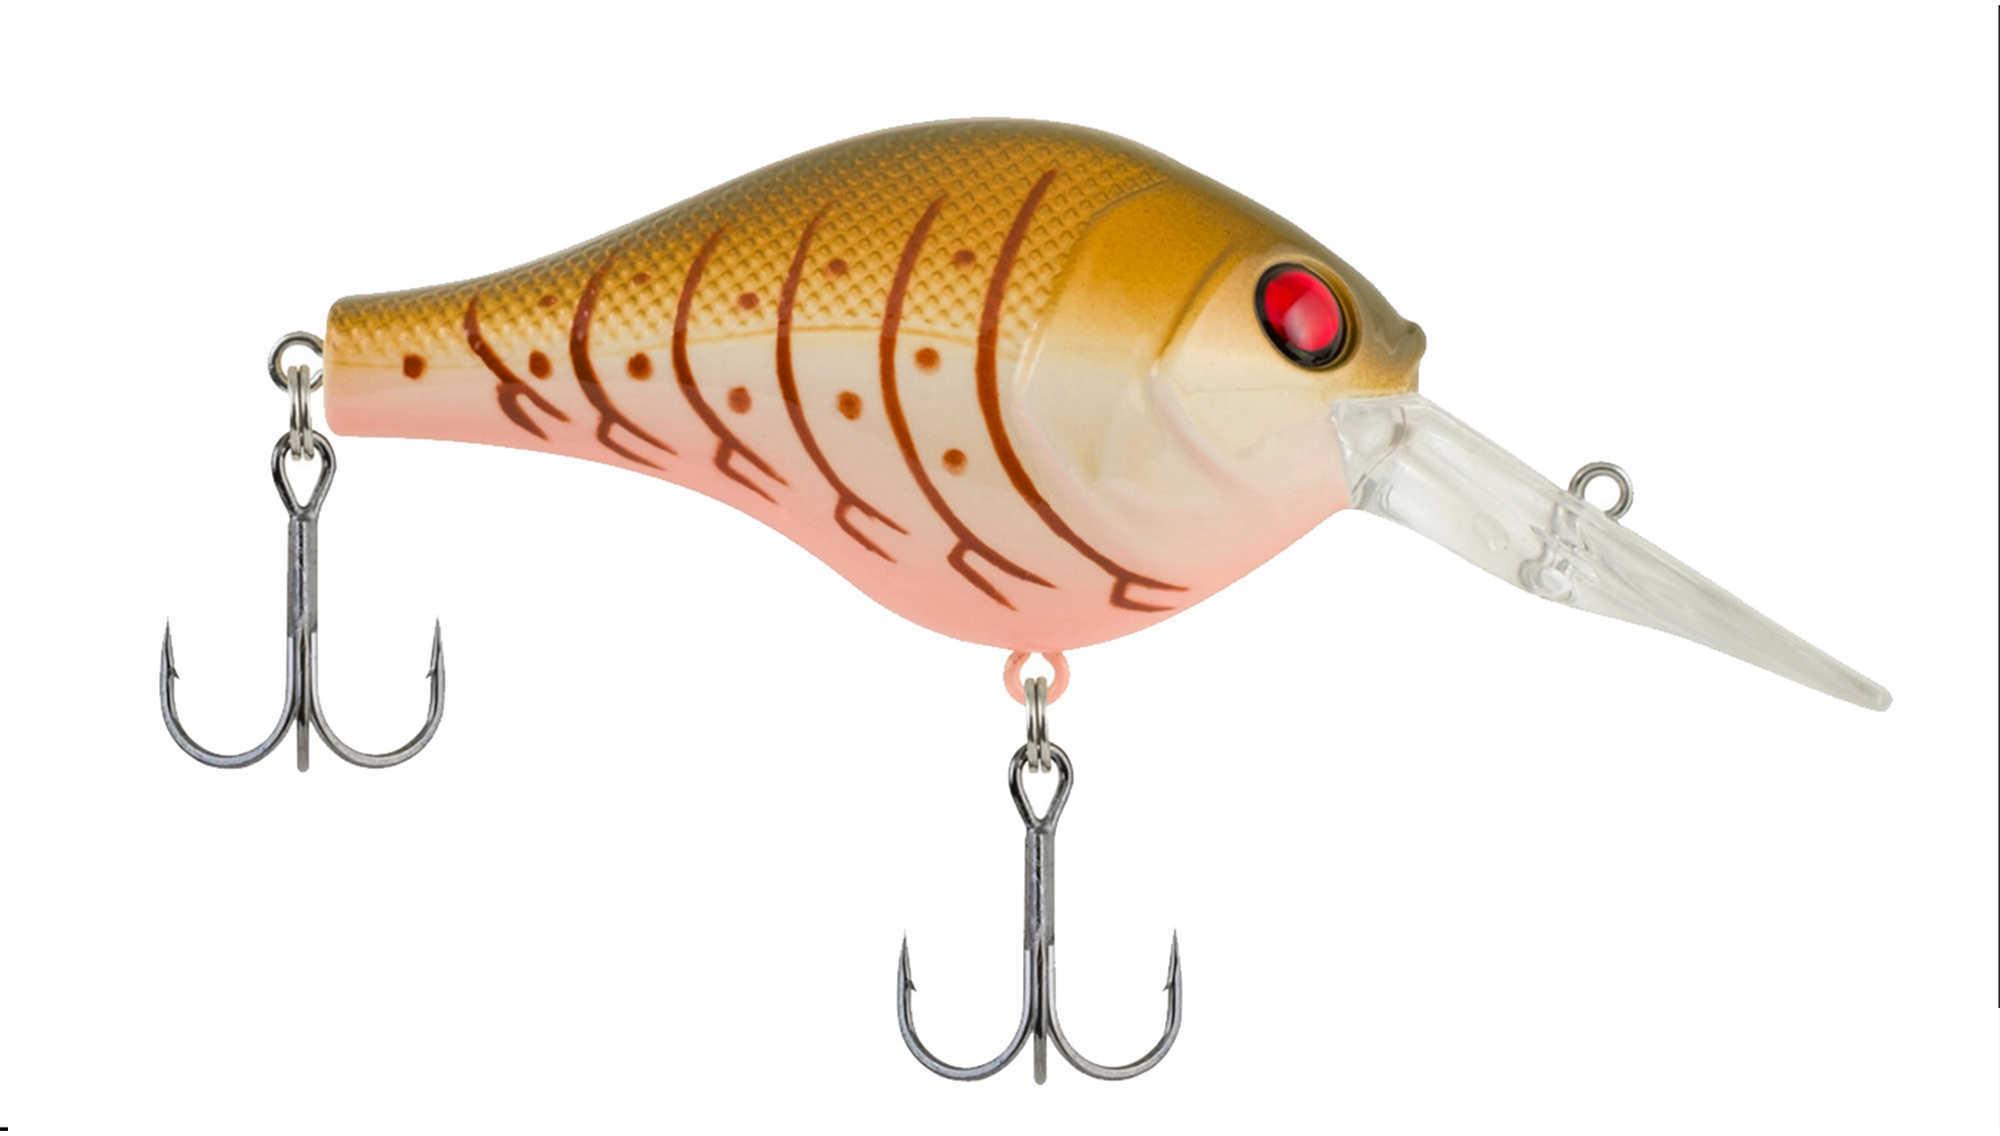 Berkley Digger Hard Bait Lure 1.75-Inches, 1/4 oz, 2 Hooks, 3'-5' Depth, Olive Cream Craw, Per 1 Md: 1431193